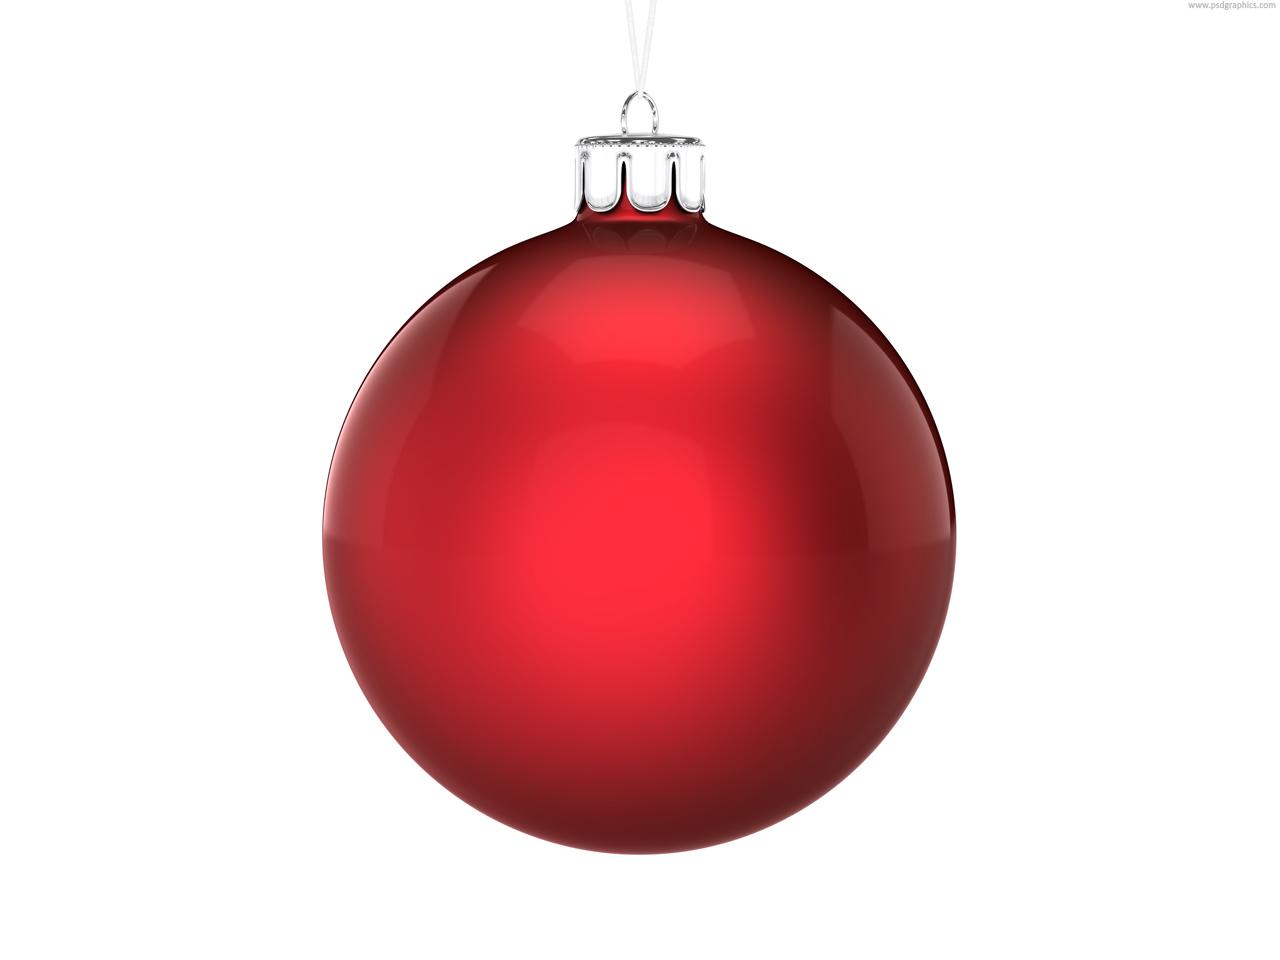 Christmas Bulb Clipart - Clipart Suggest